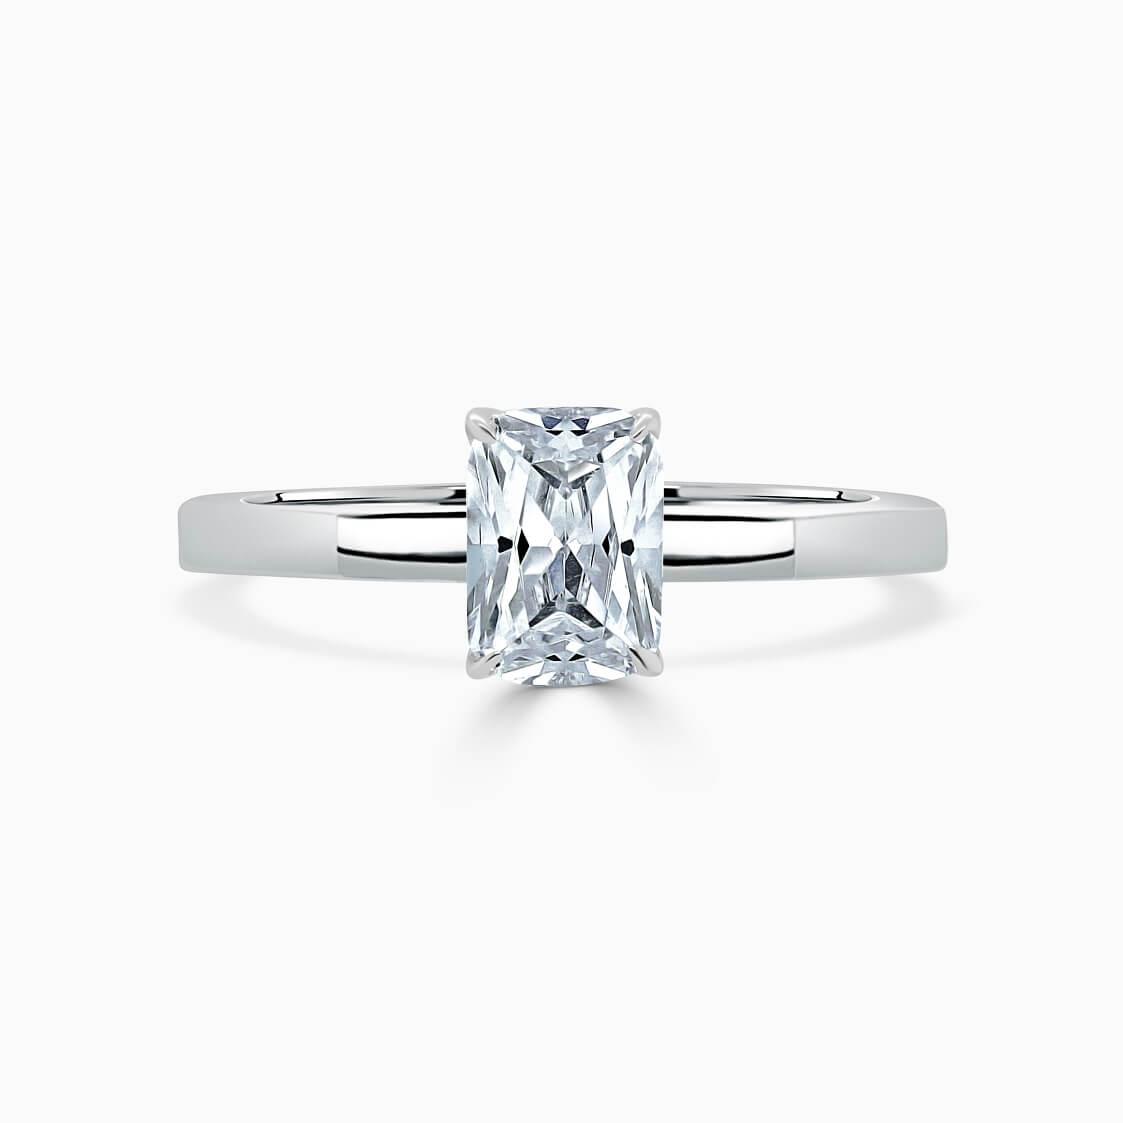 18ct White Gold Radiant Cut Geometric Engagement Ring